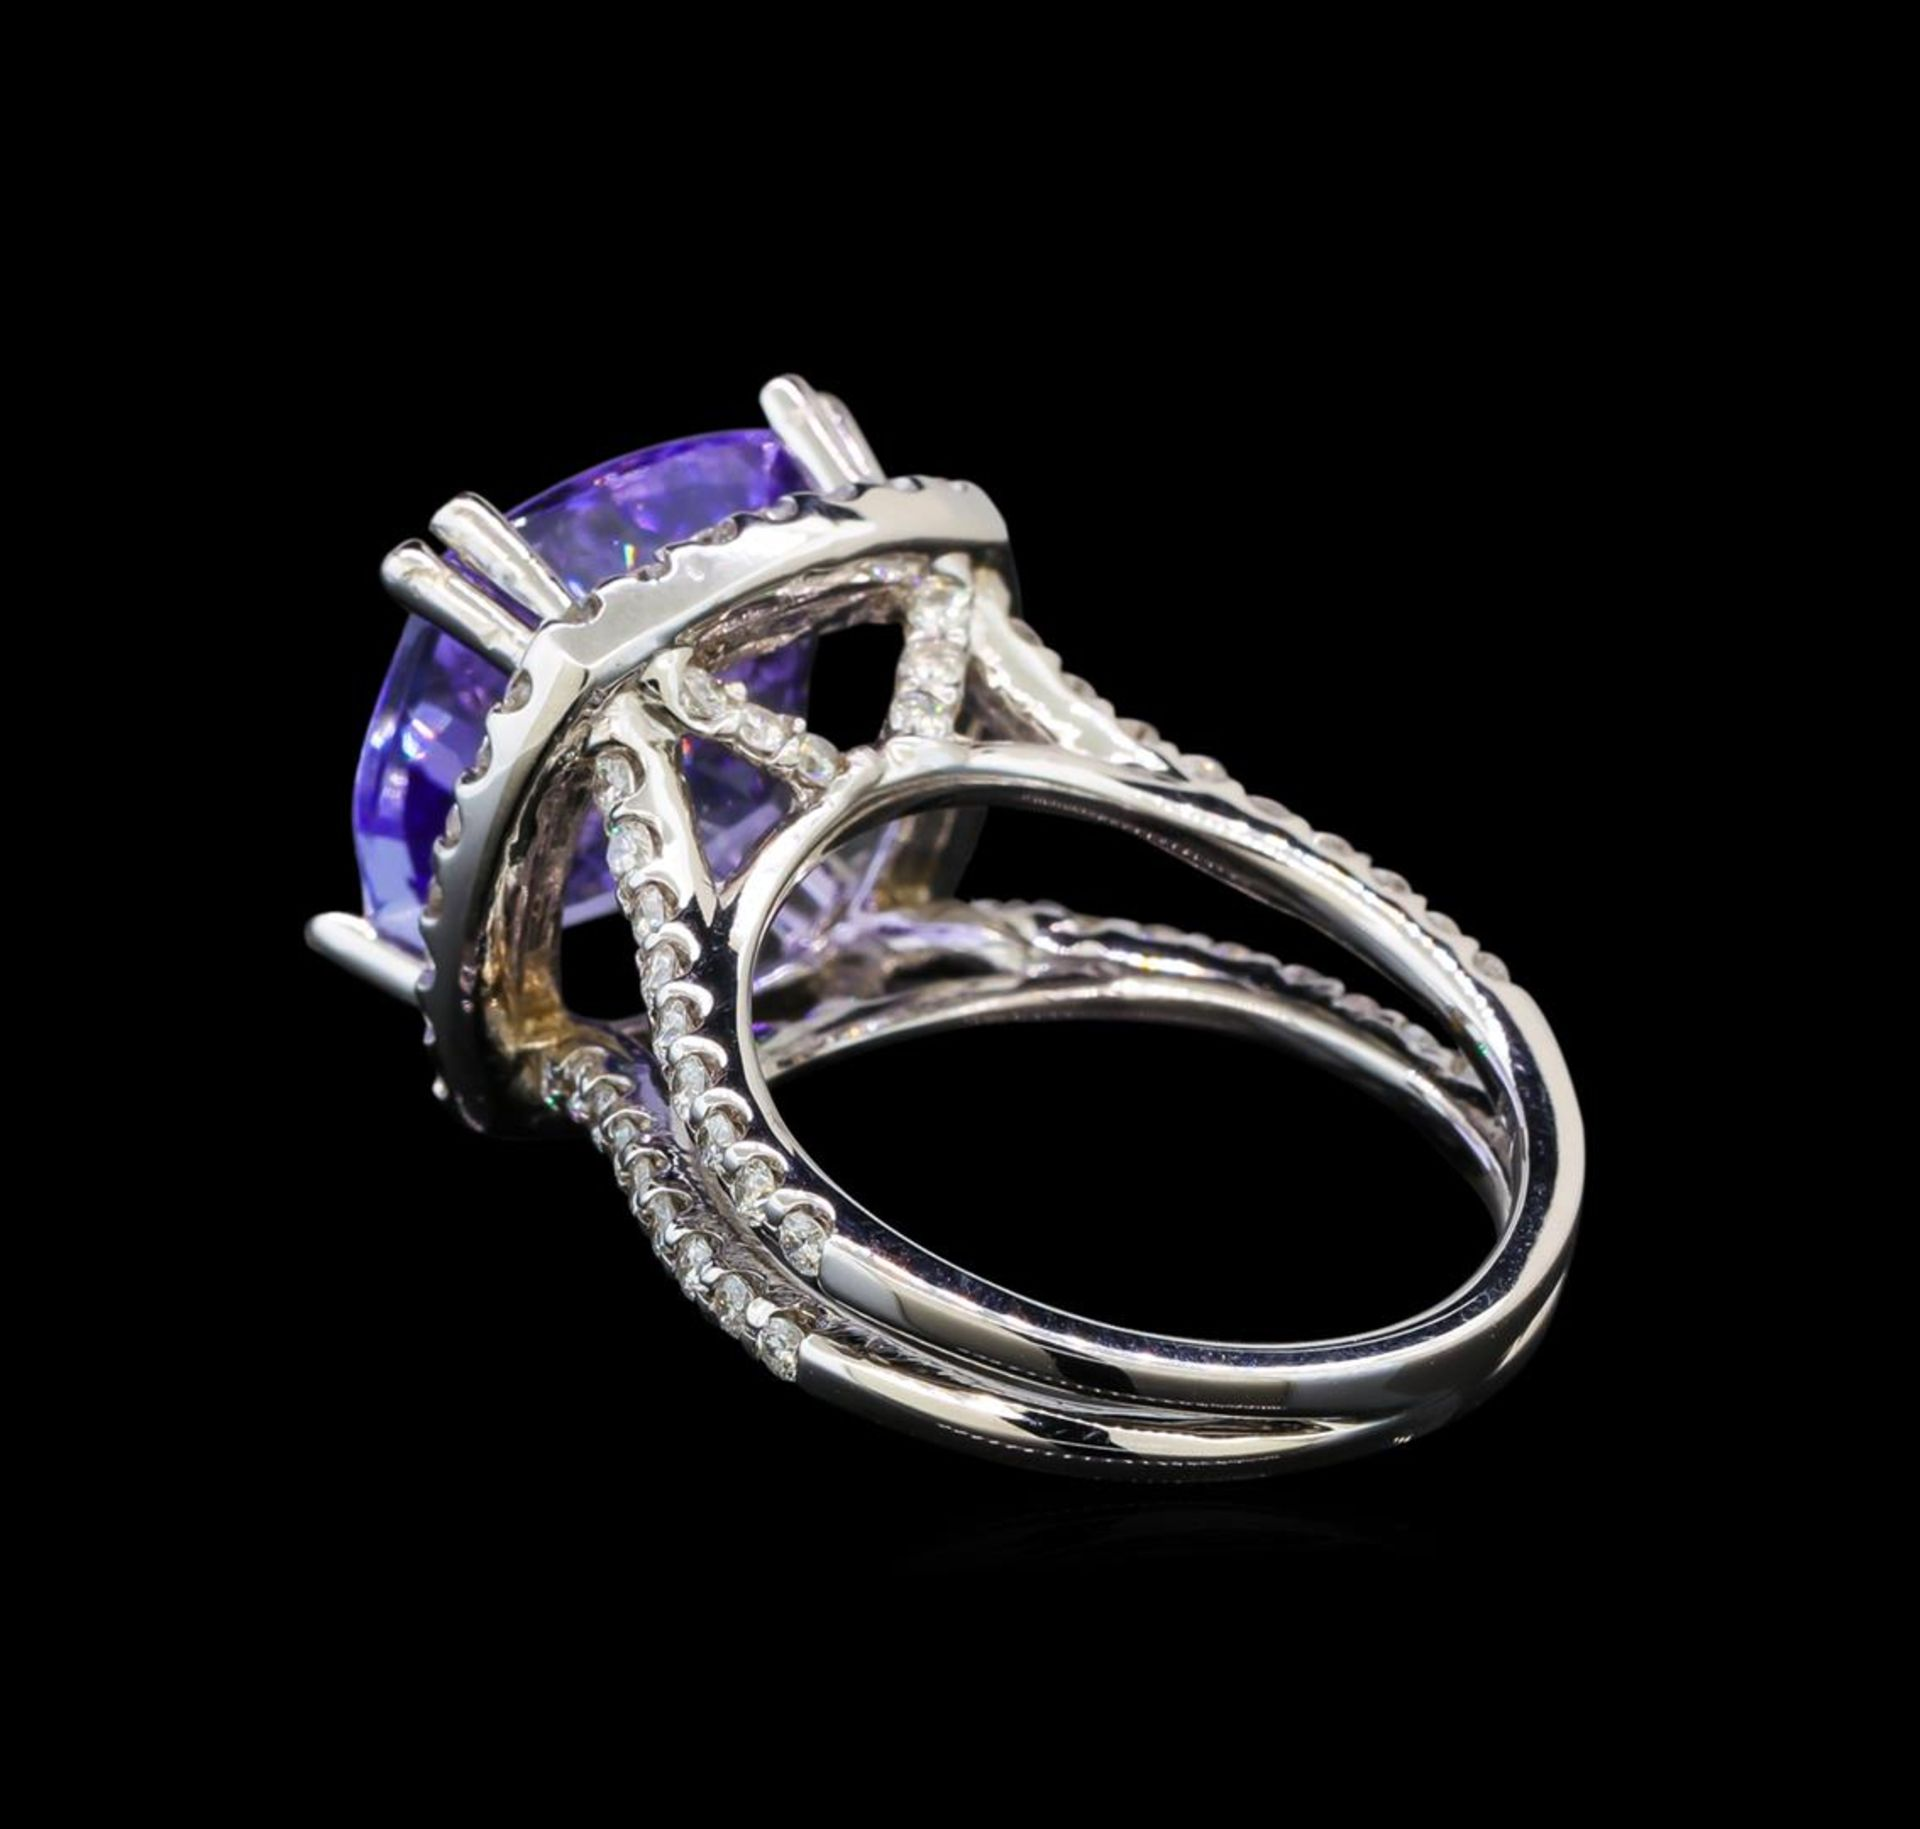 14KT White Gold 9.07 ctw Tanzanite and Diamond Ring - Image 3 of 5